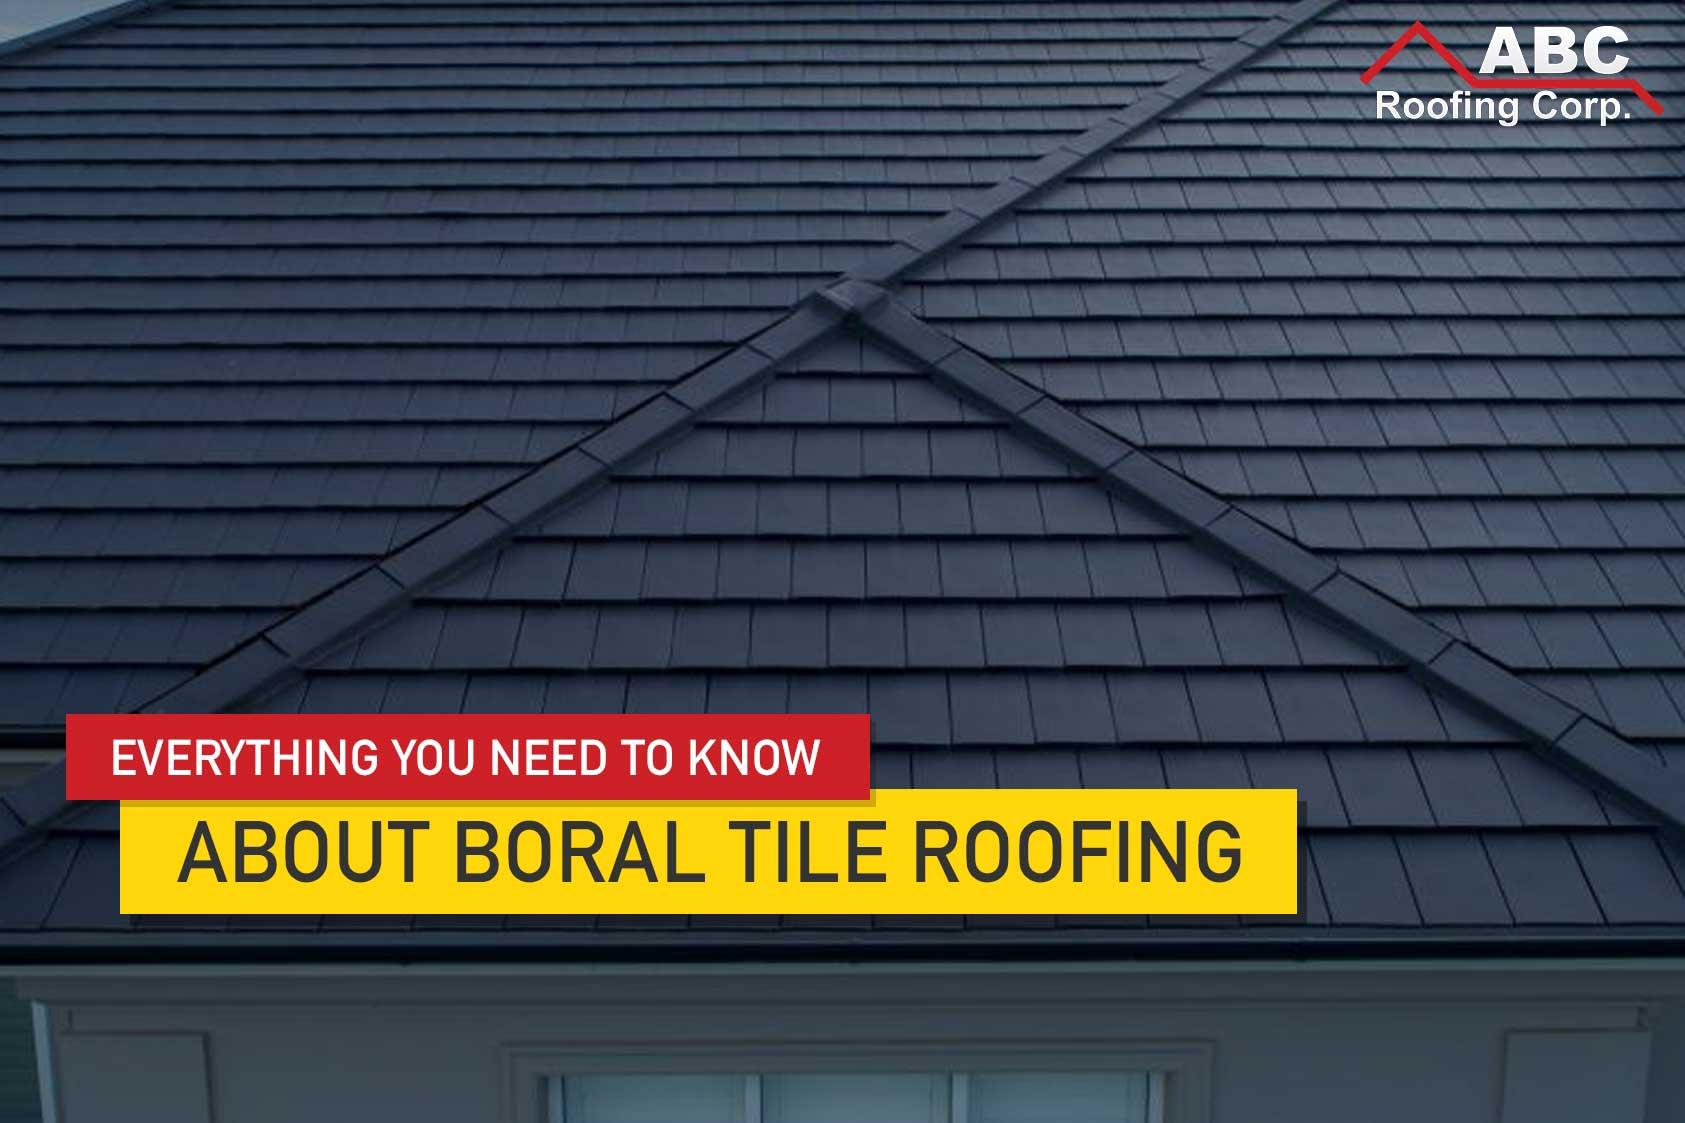 Boral Tile Roofing